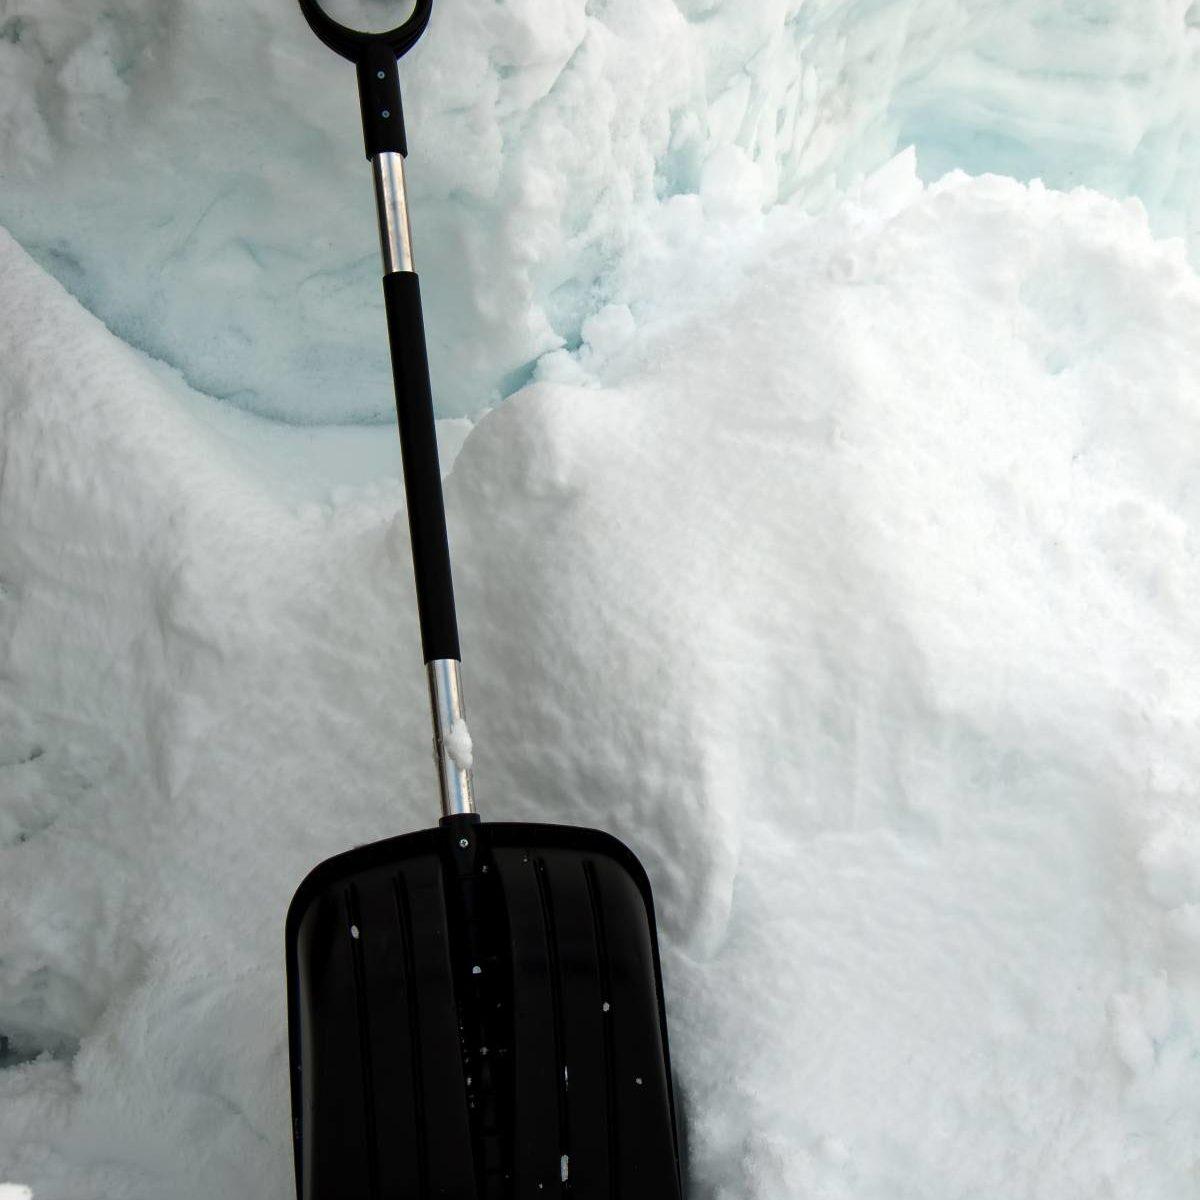 utah-professional-snow-removal